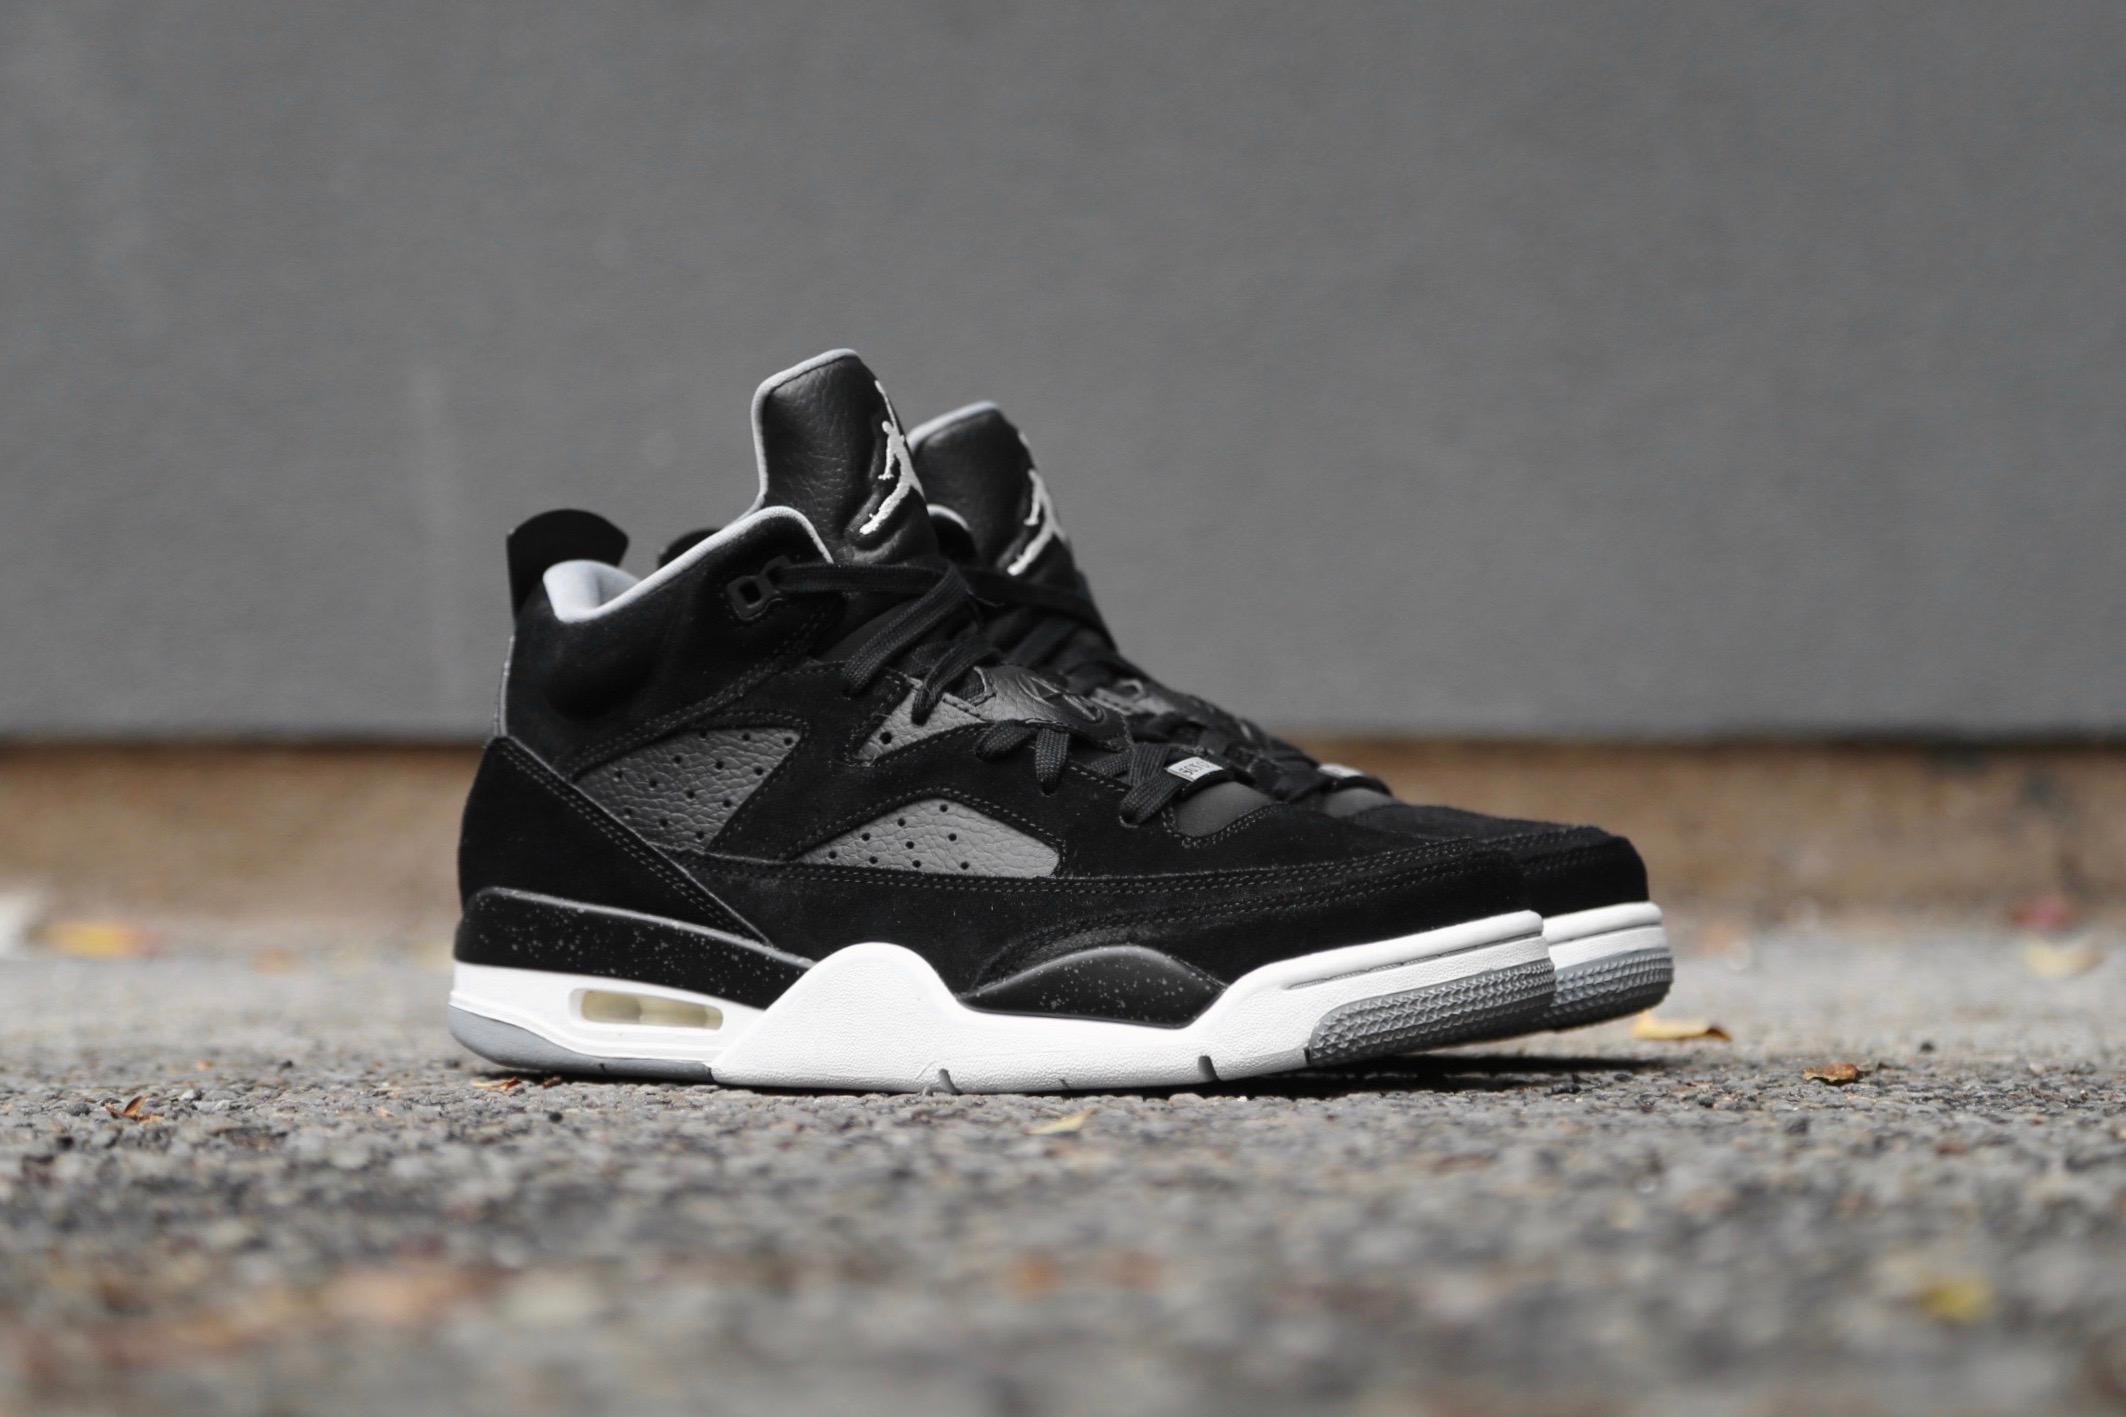 separation shoes a4a3d 61440 Jordan Son Of Mars Low – Black   Particle Grey   Iron Grey   White ...